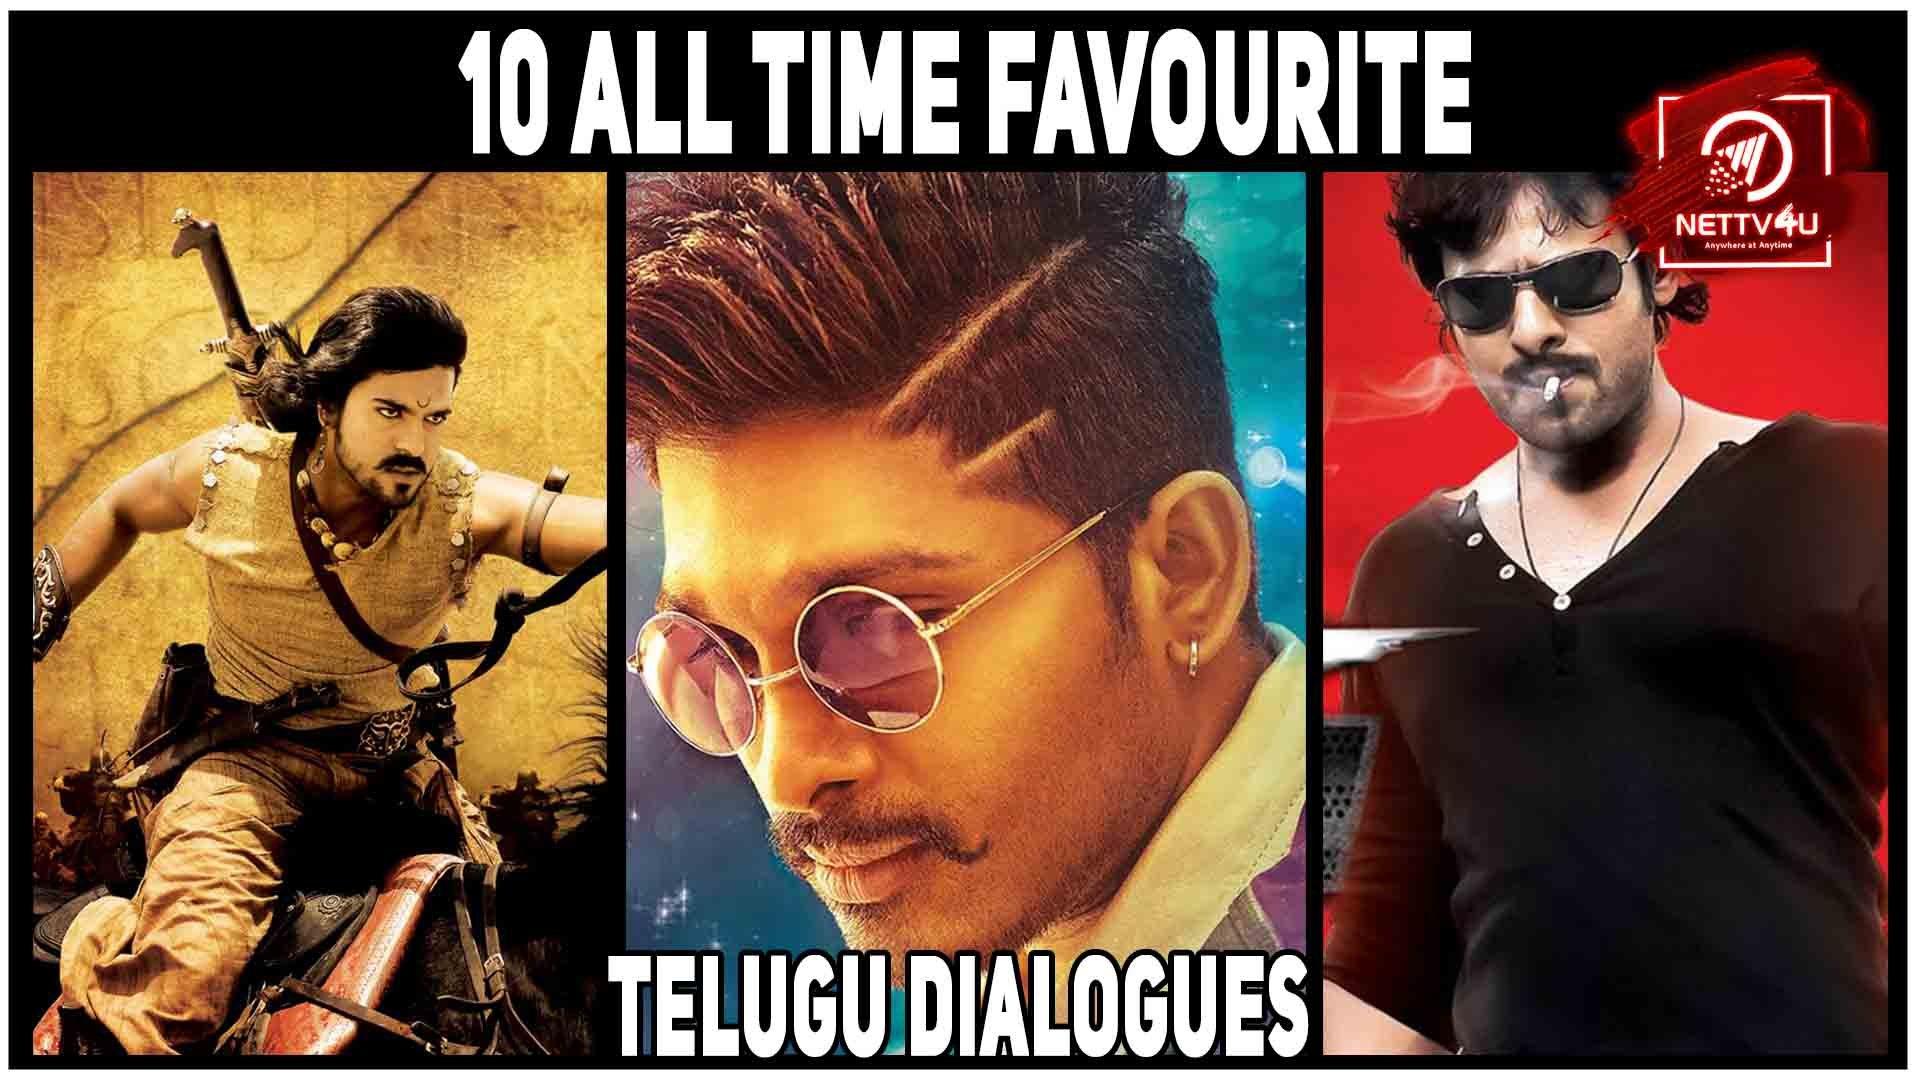 10 All Time Favourite Telugu Dialogues Latest Articles Nettv4u